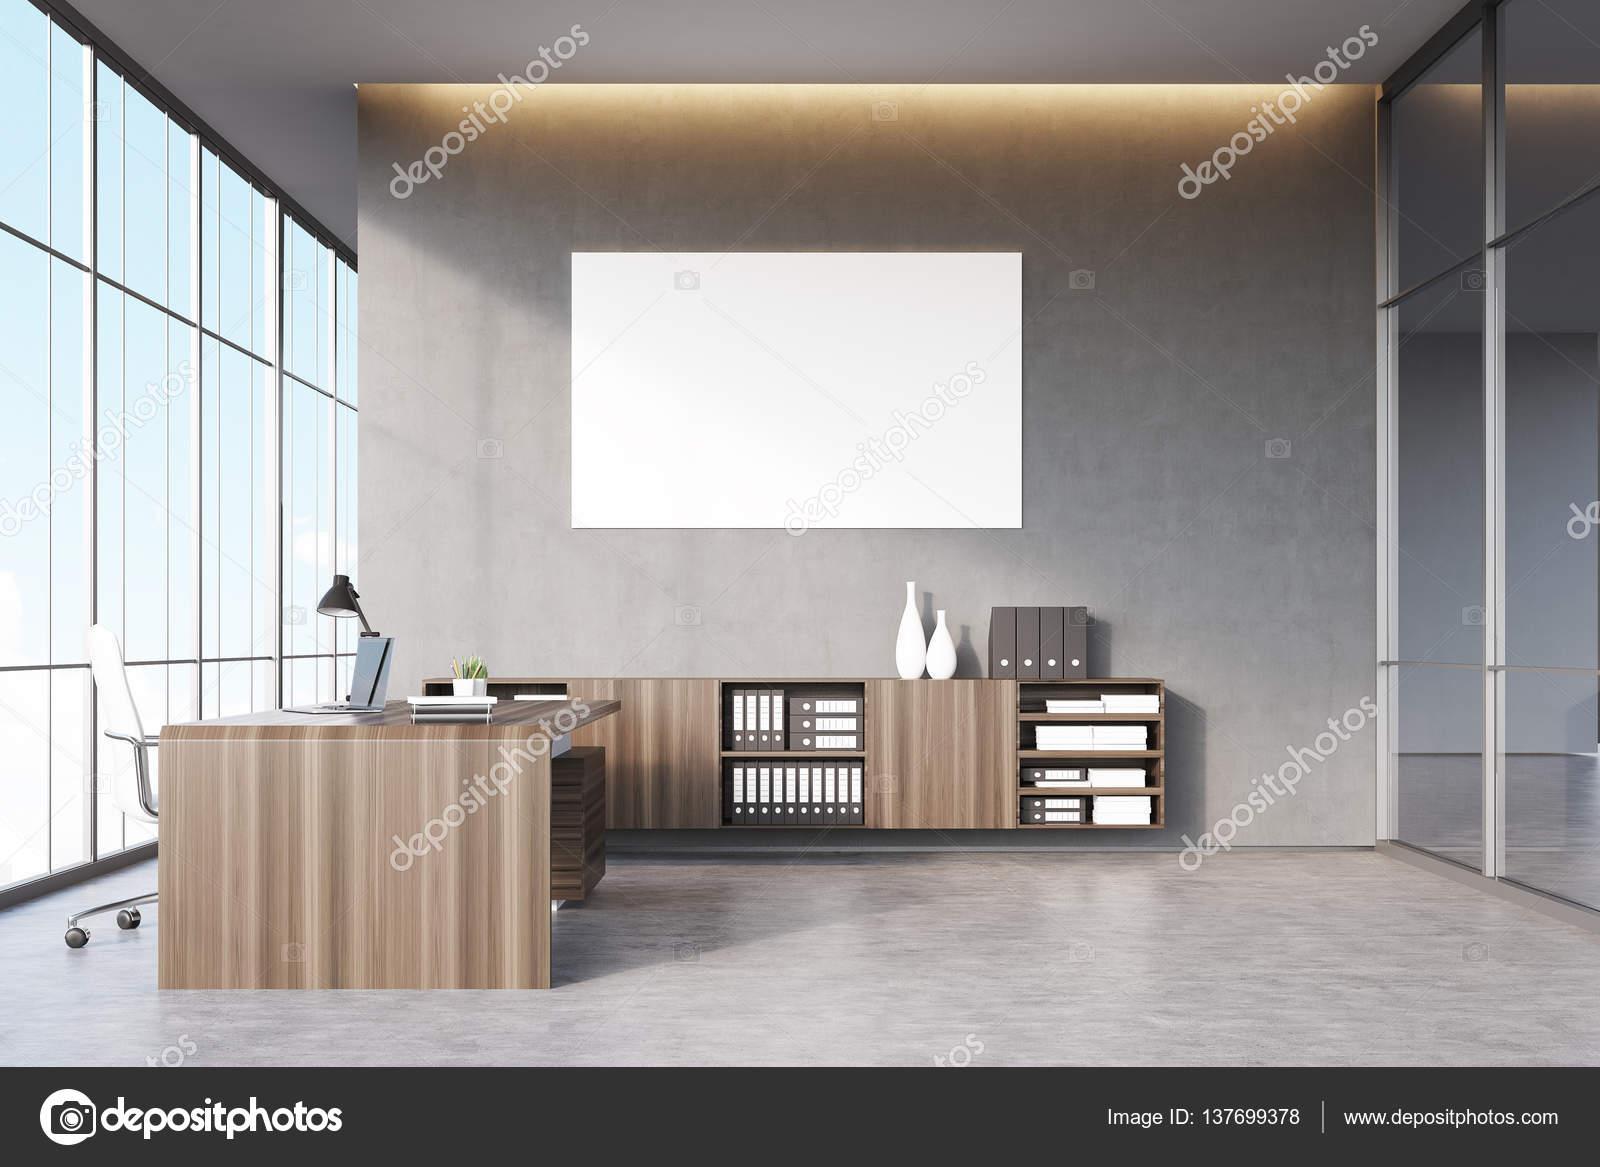 Director General Oficina Con Muebles De Madera Oscura Ventana  # Muebles Didecor